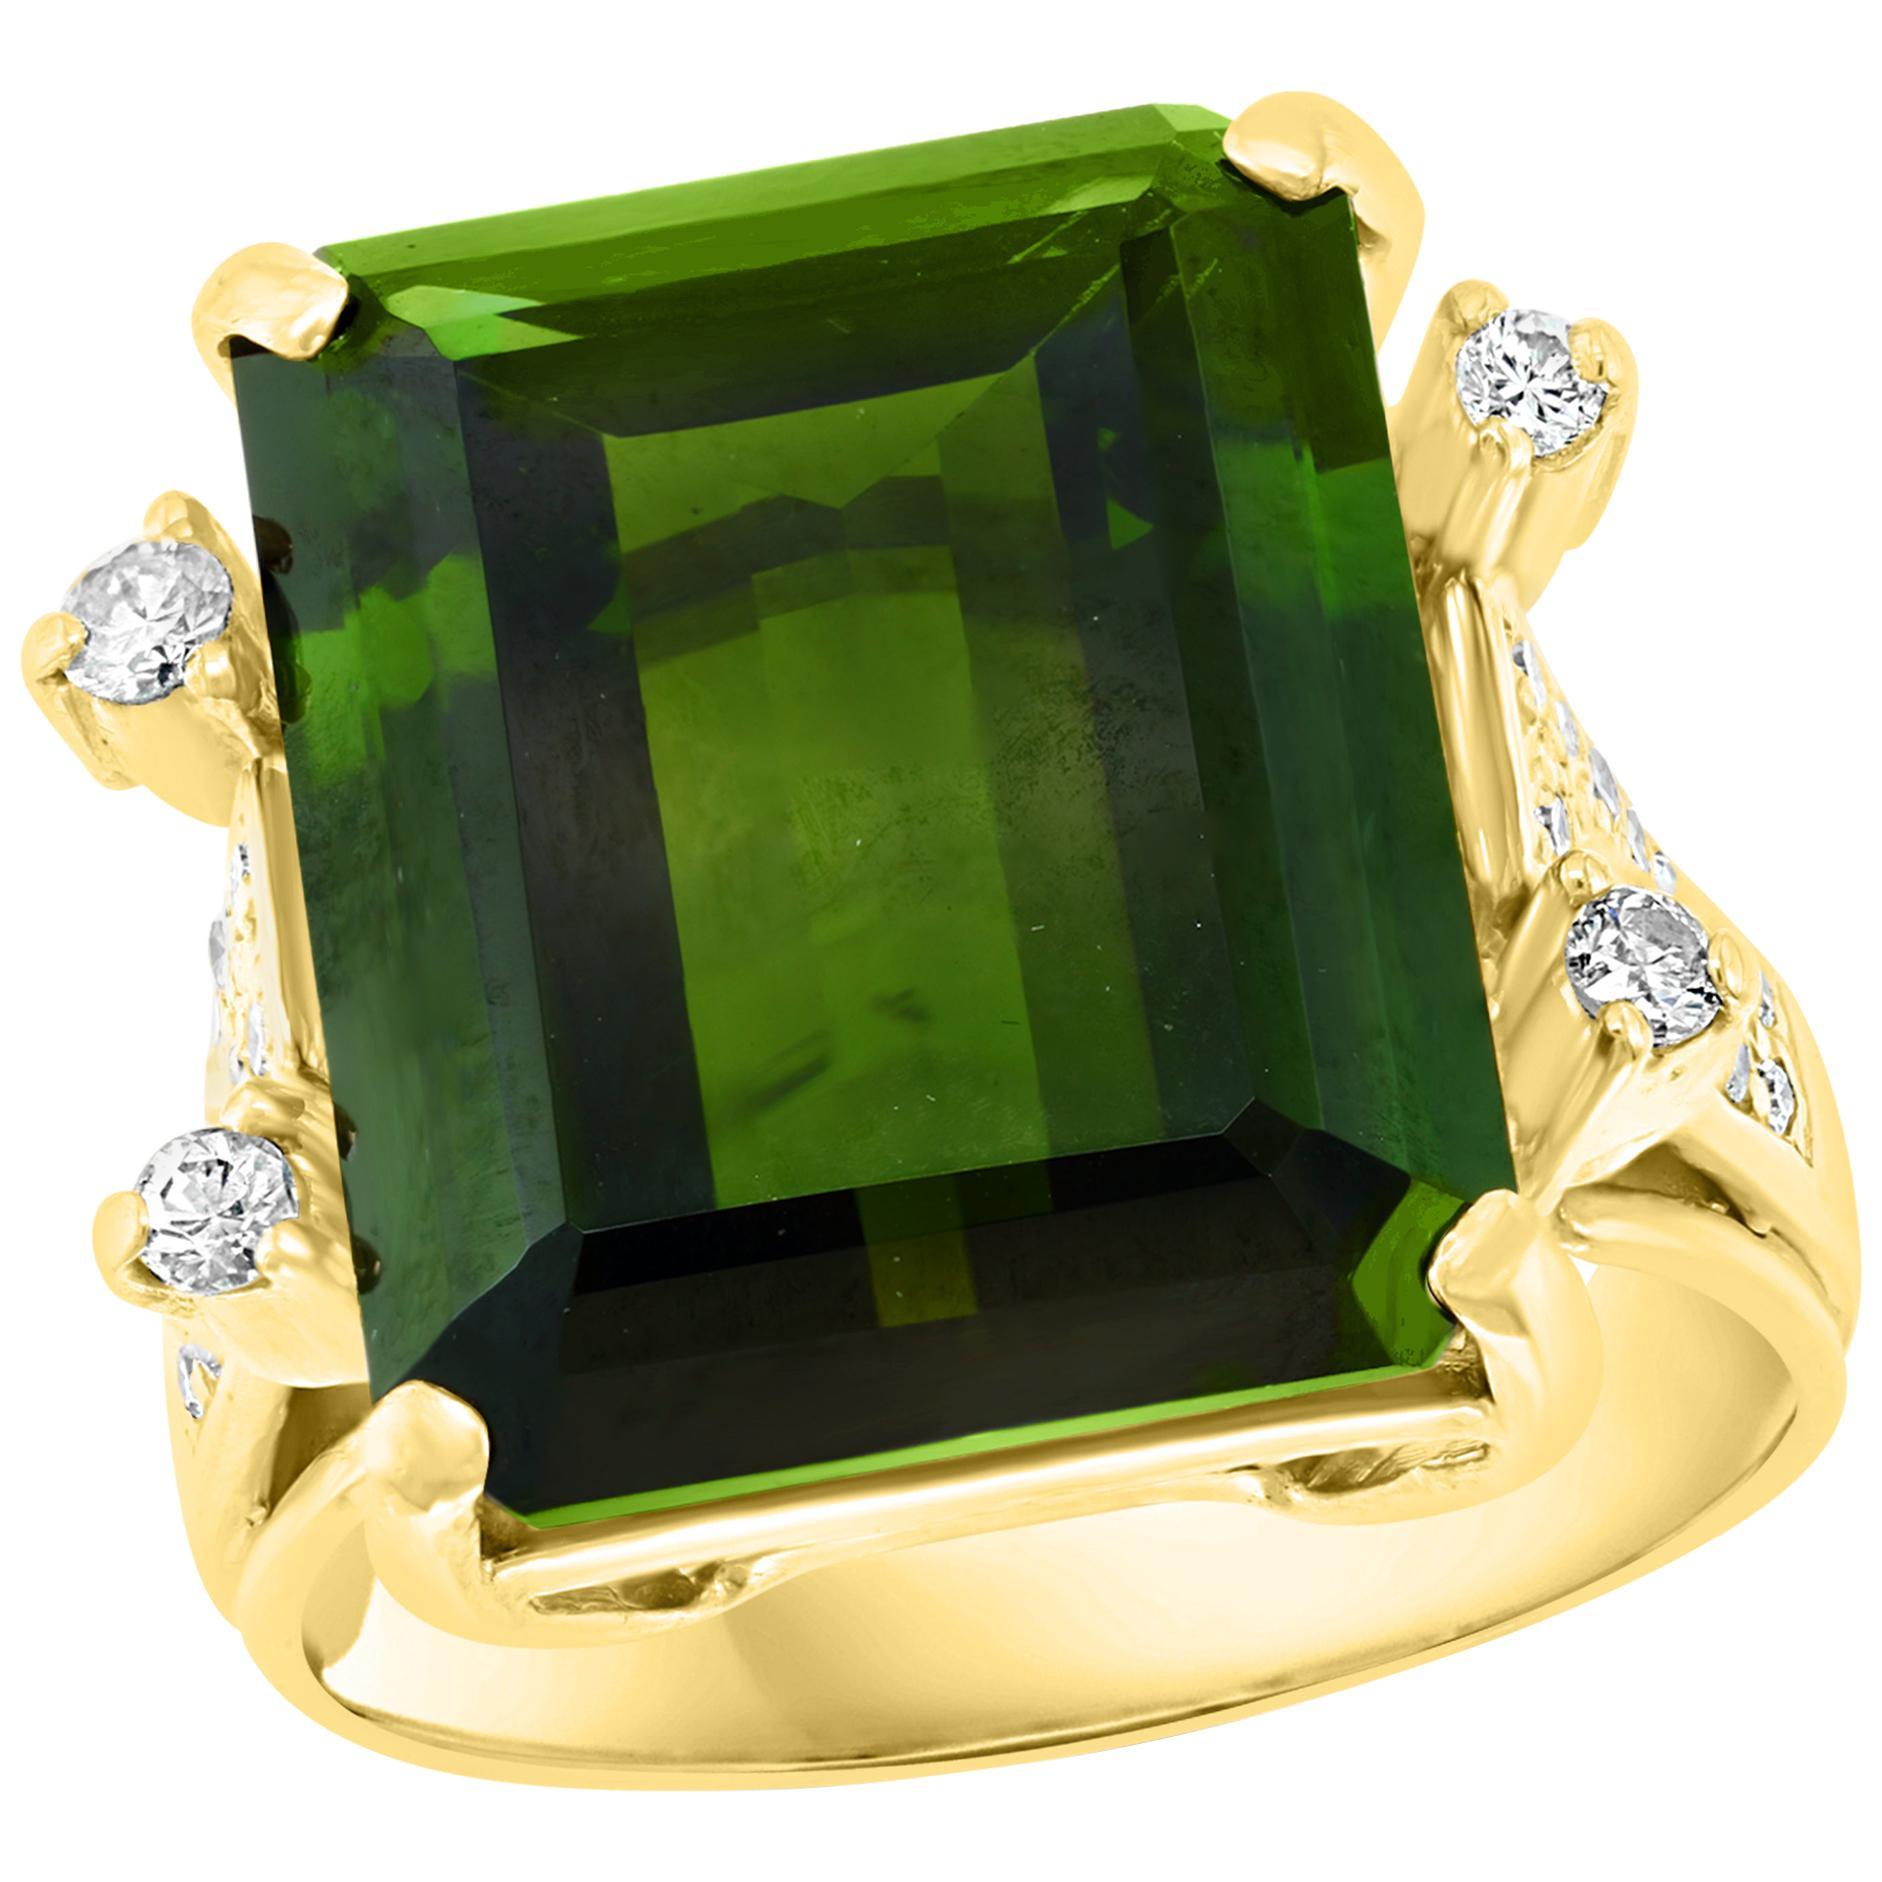 12 + Carat Green Tourmaline and 0.50 Ct Diamond Cocktail Ring 18K Yellow Gold